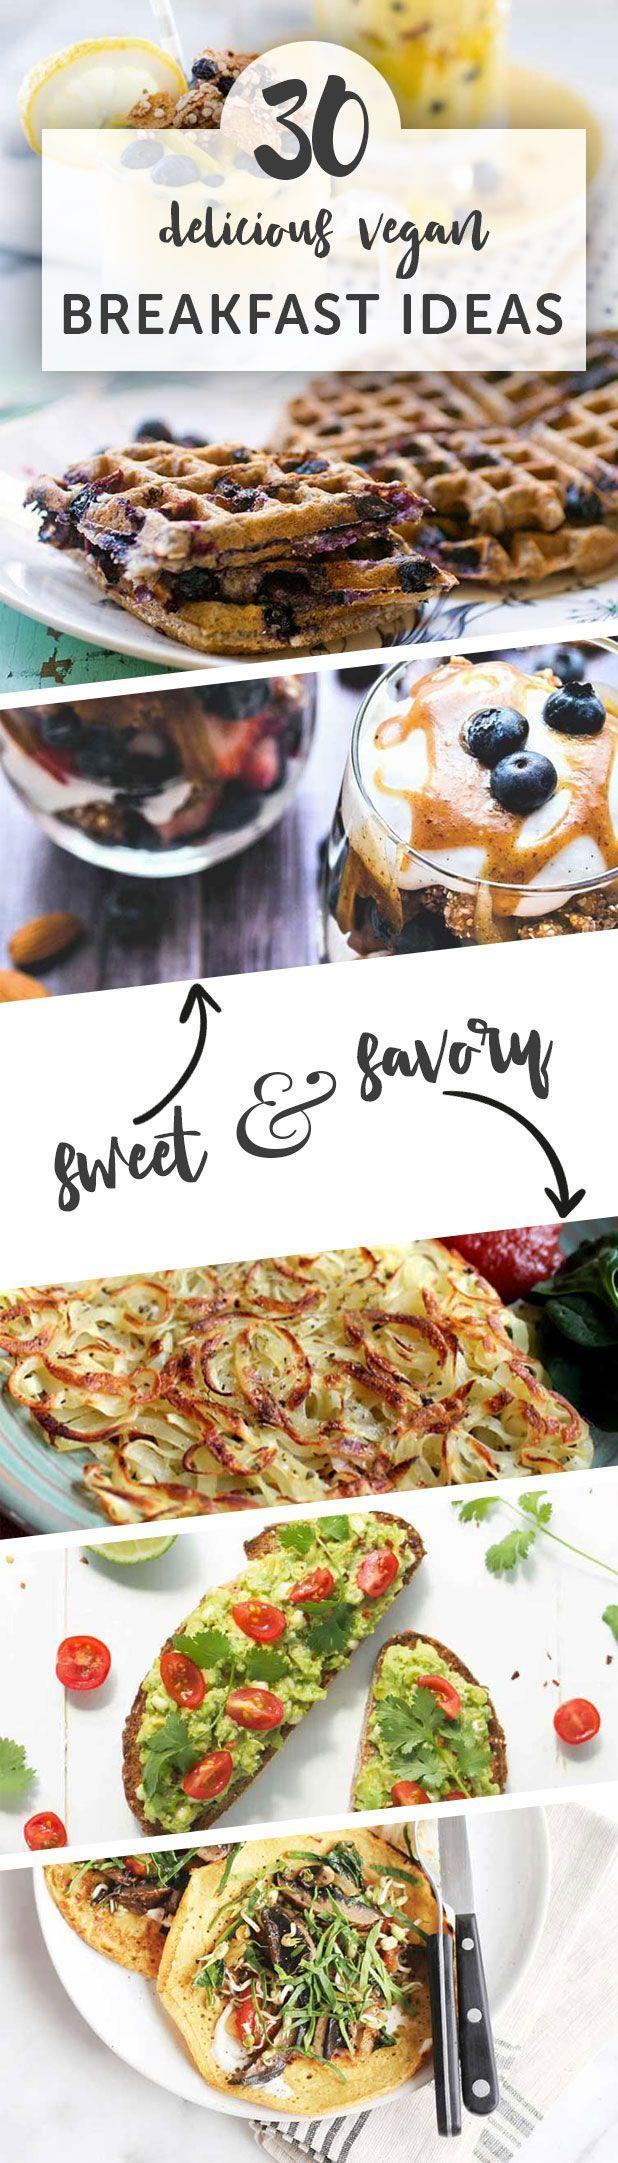 30 Delicious Vegan Breakfast Recipes